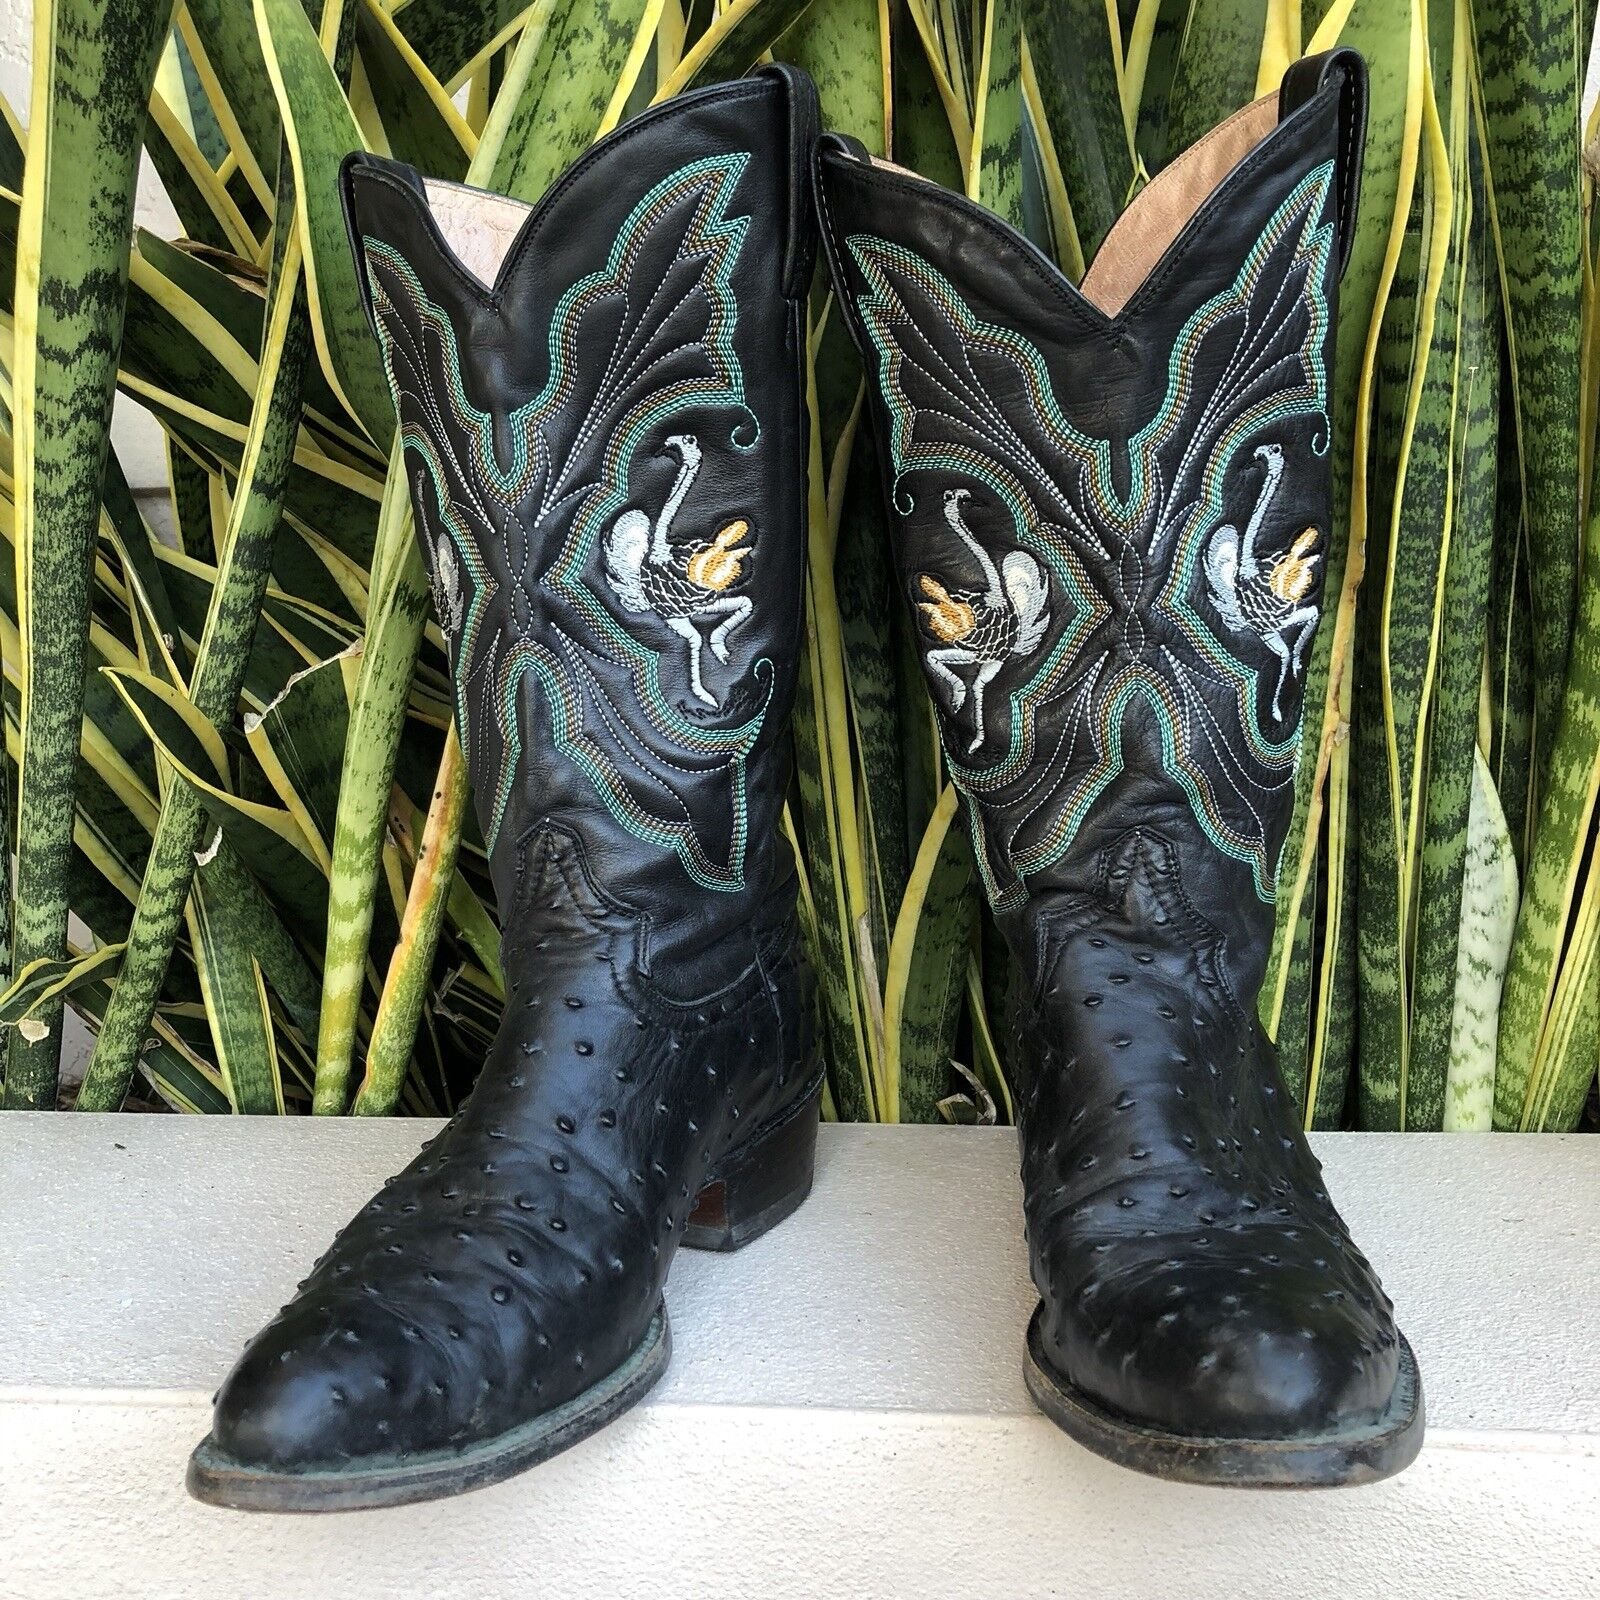 Rancho para hombre de cuero negro botas de vaquero occidental 27 1 2 Avestruz bordado de México